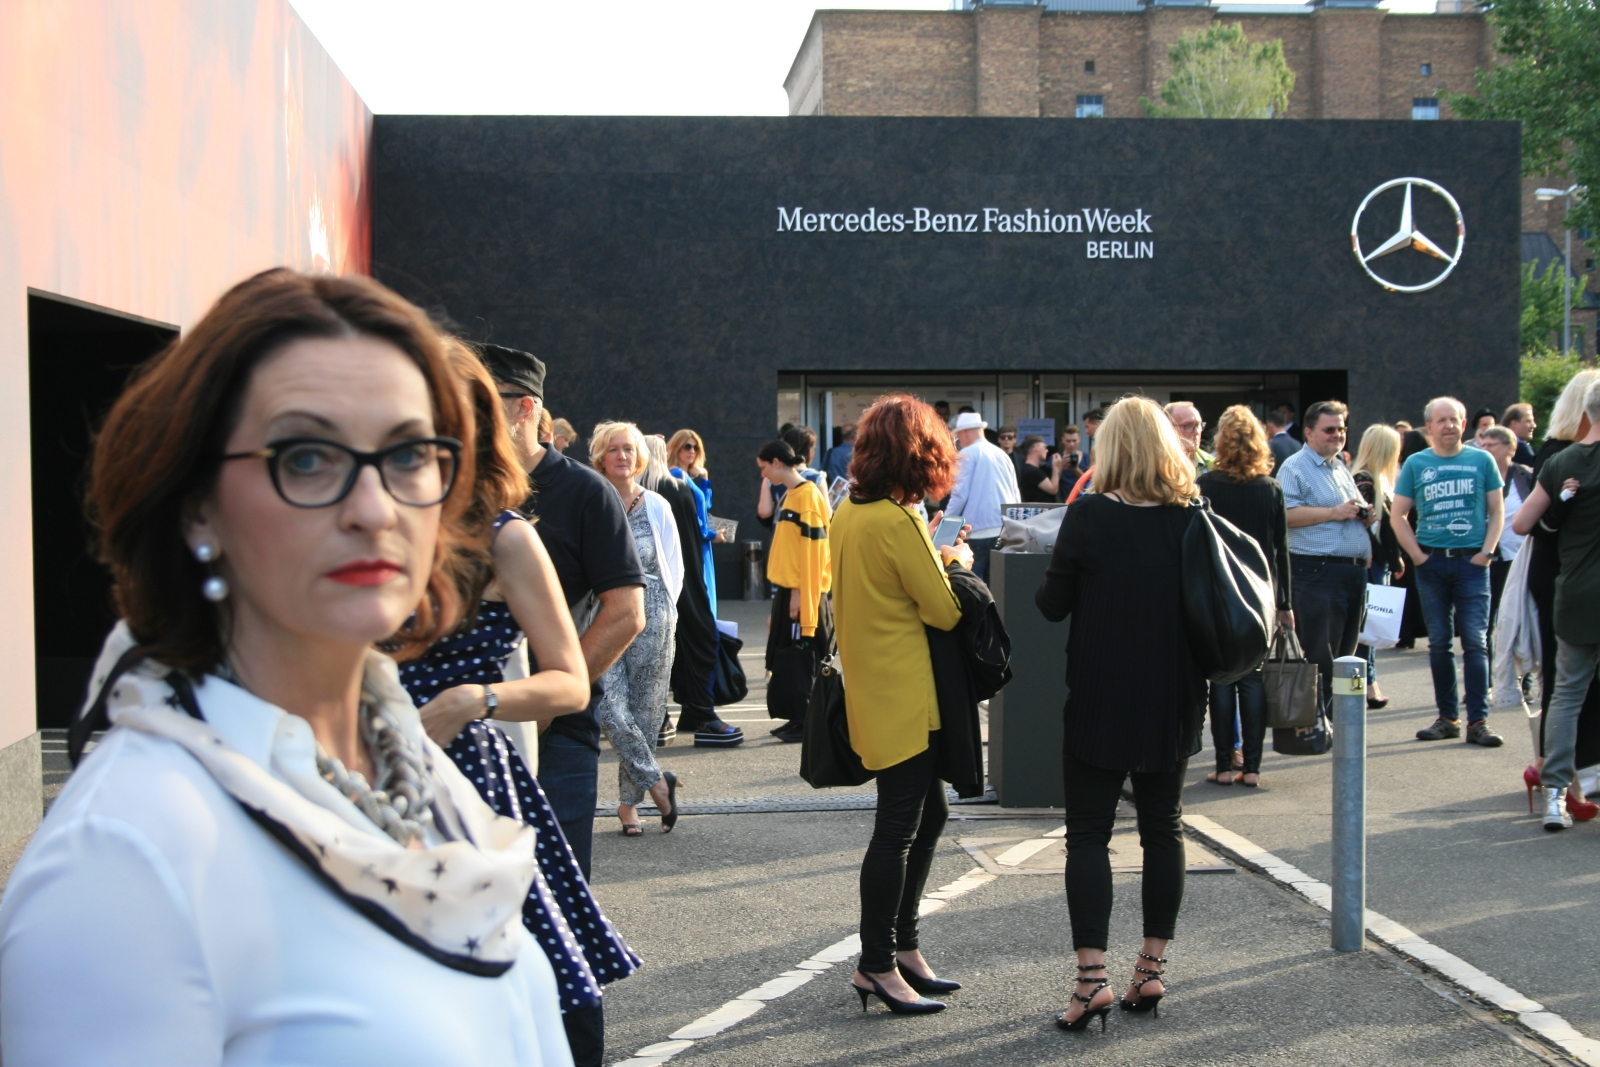 Fashionweek Berlin